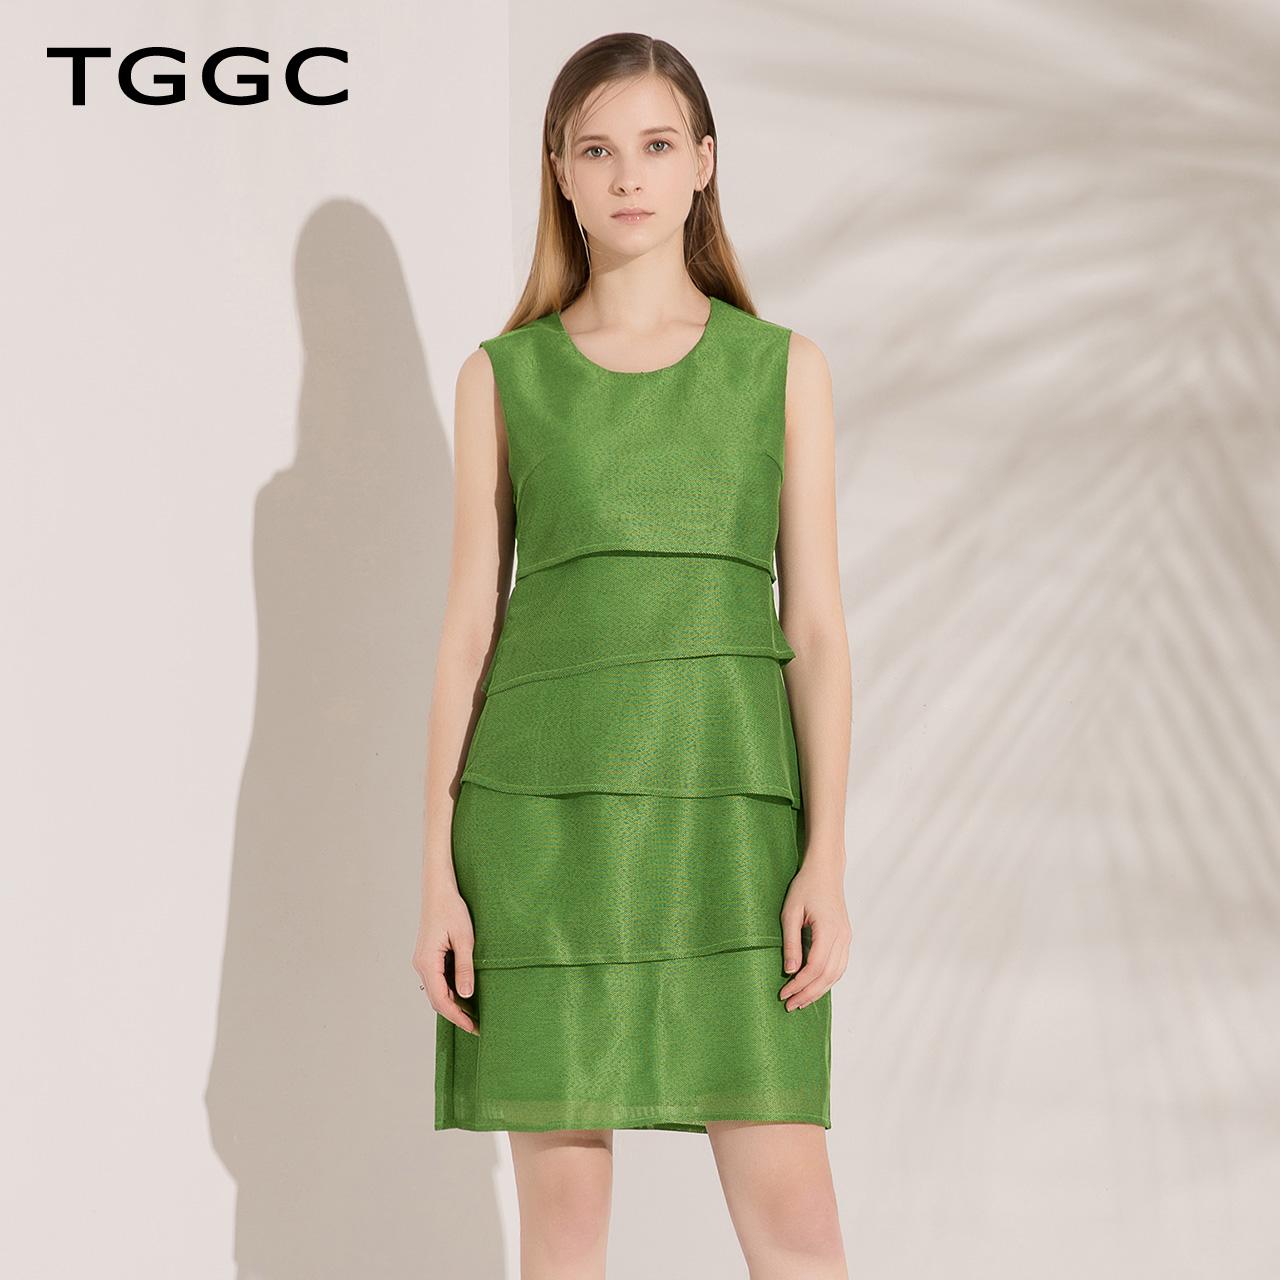 TGGC 2018春装新款通勤淑女高腰修身显瘦无袖A字短款连衣裙F21988